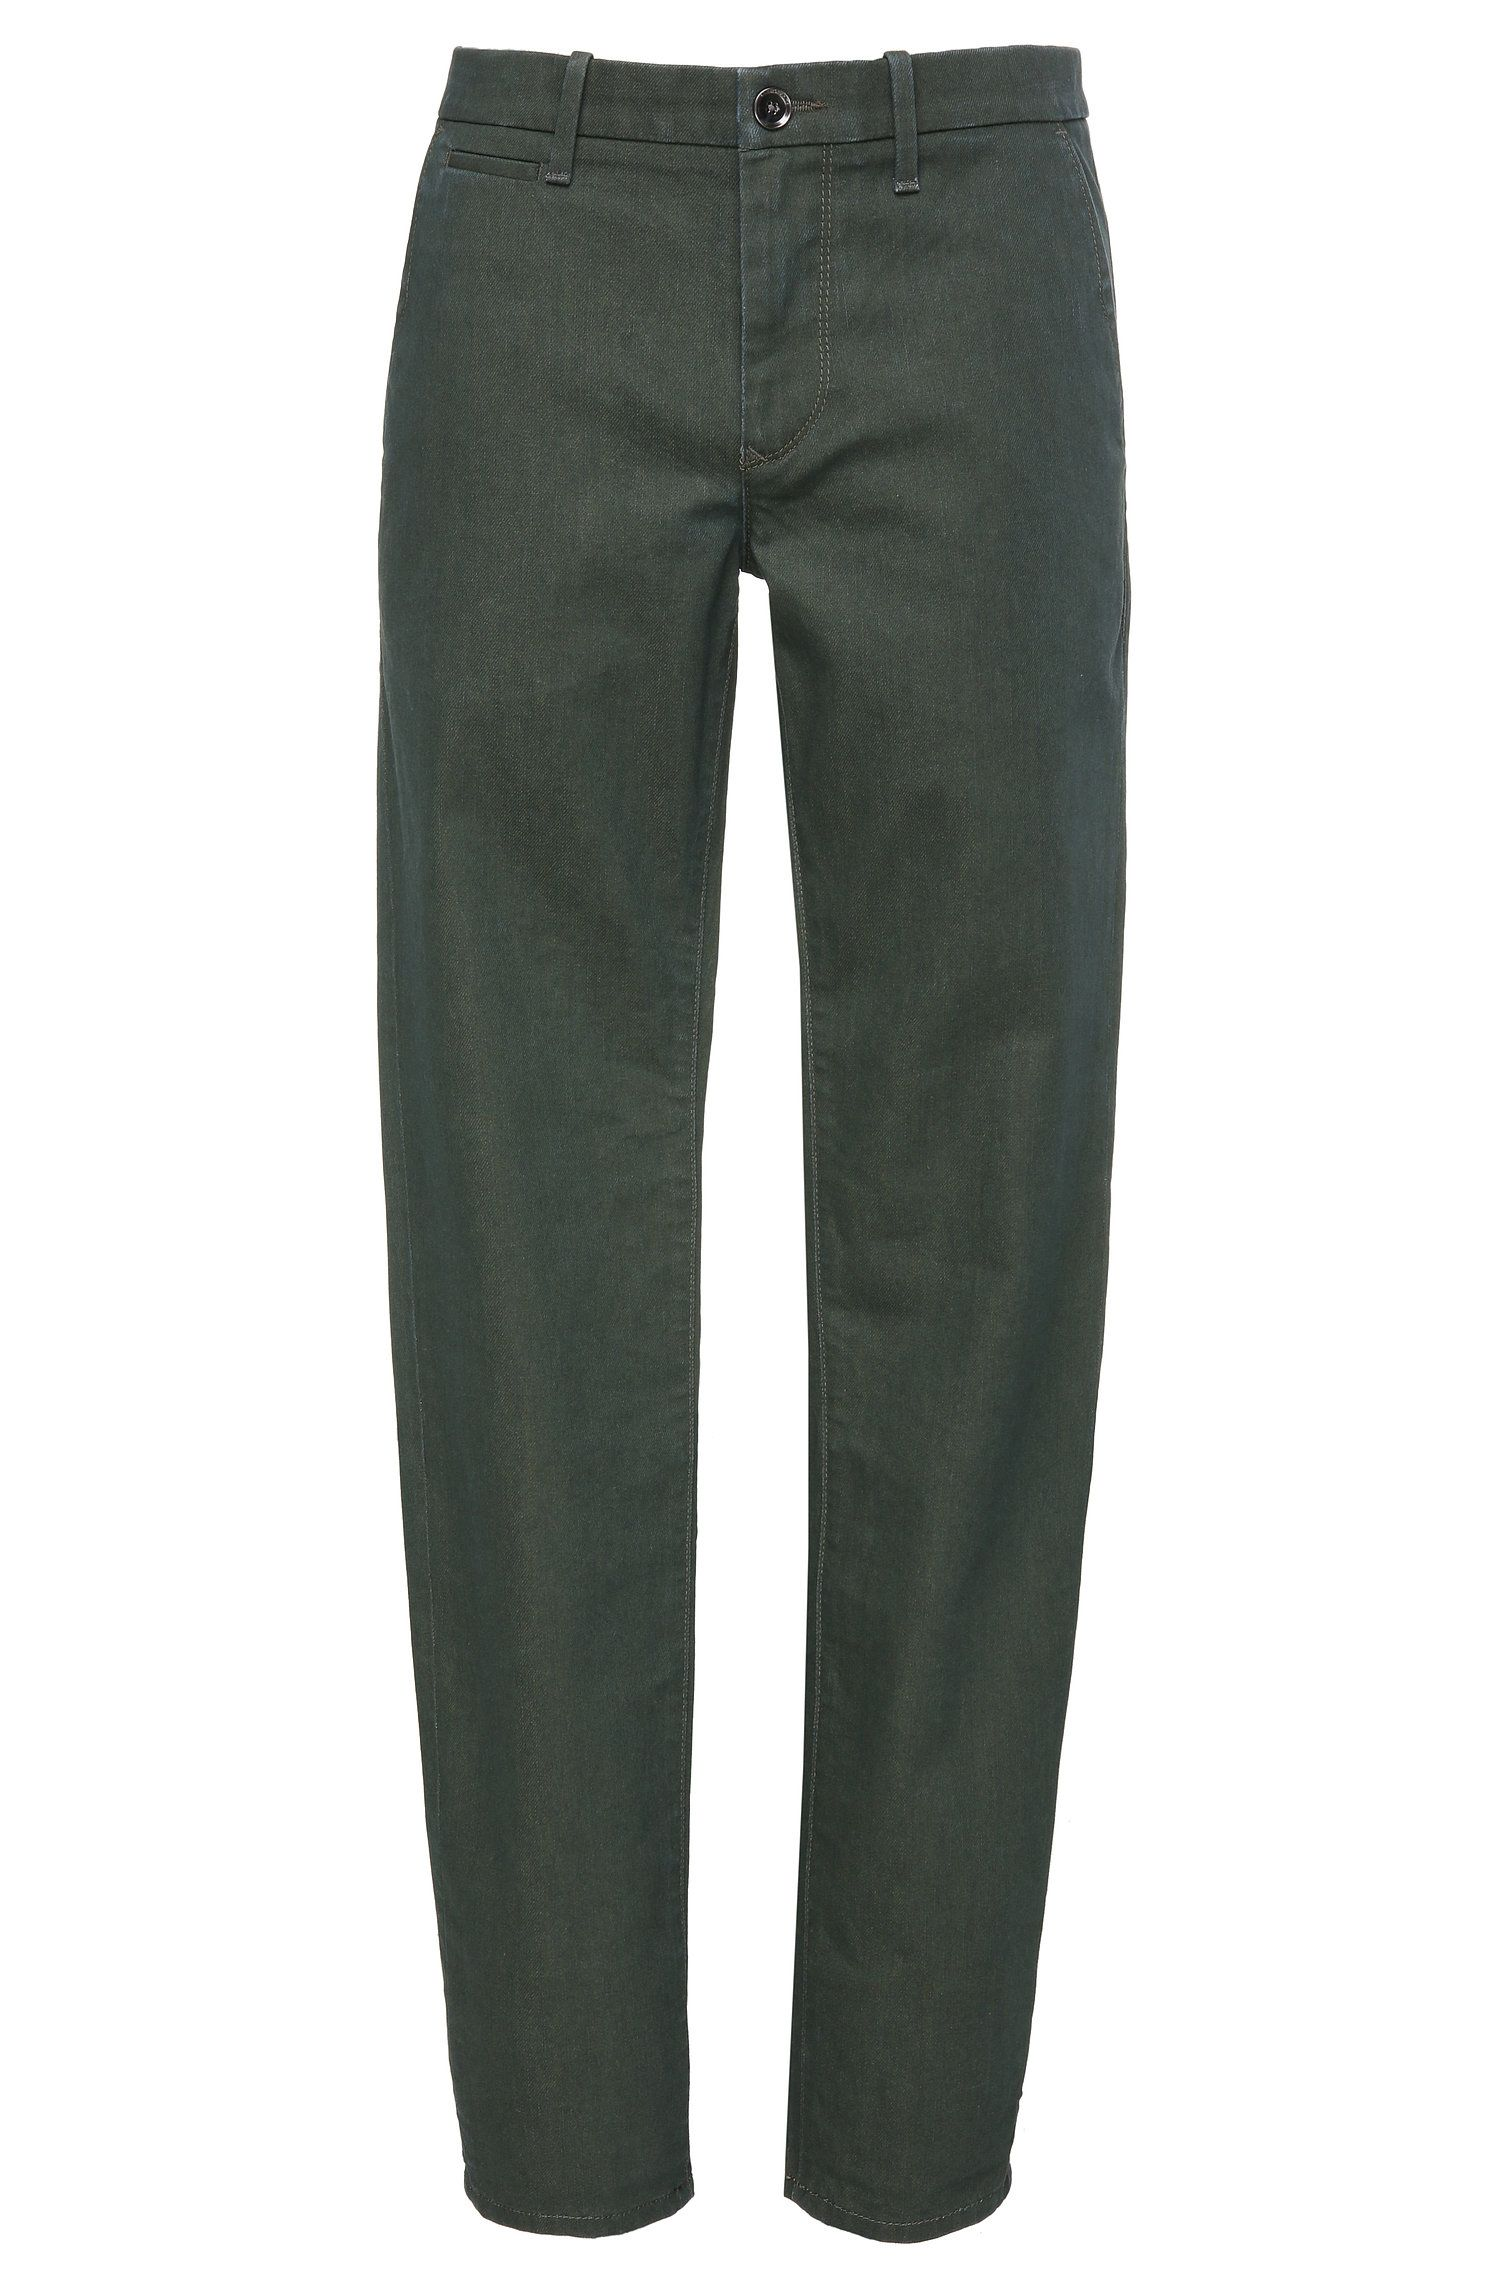 'Orange Chester62' | Slim Fit, 9.5 oz Stretch Cotton Denim Trousers